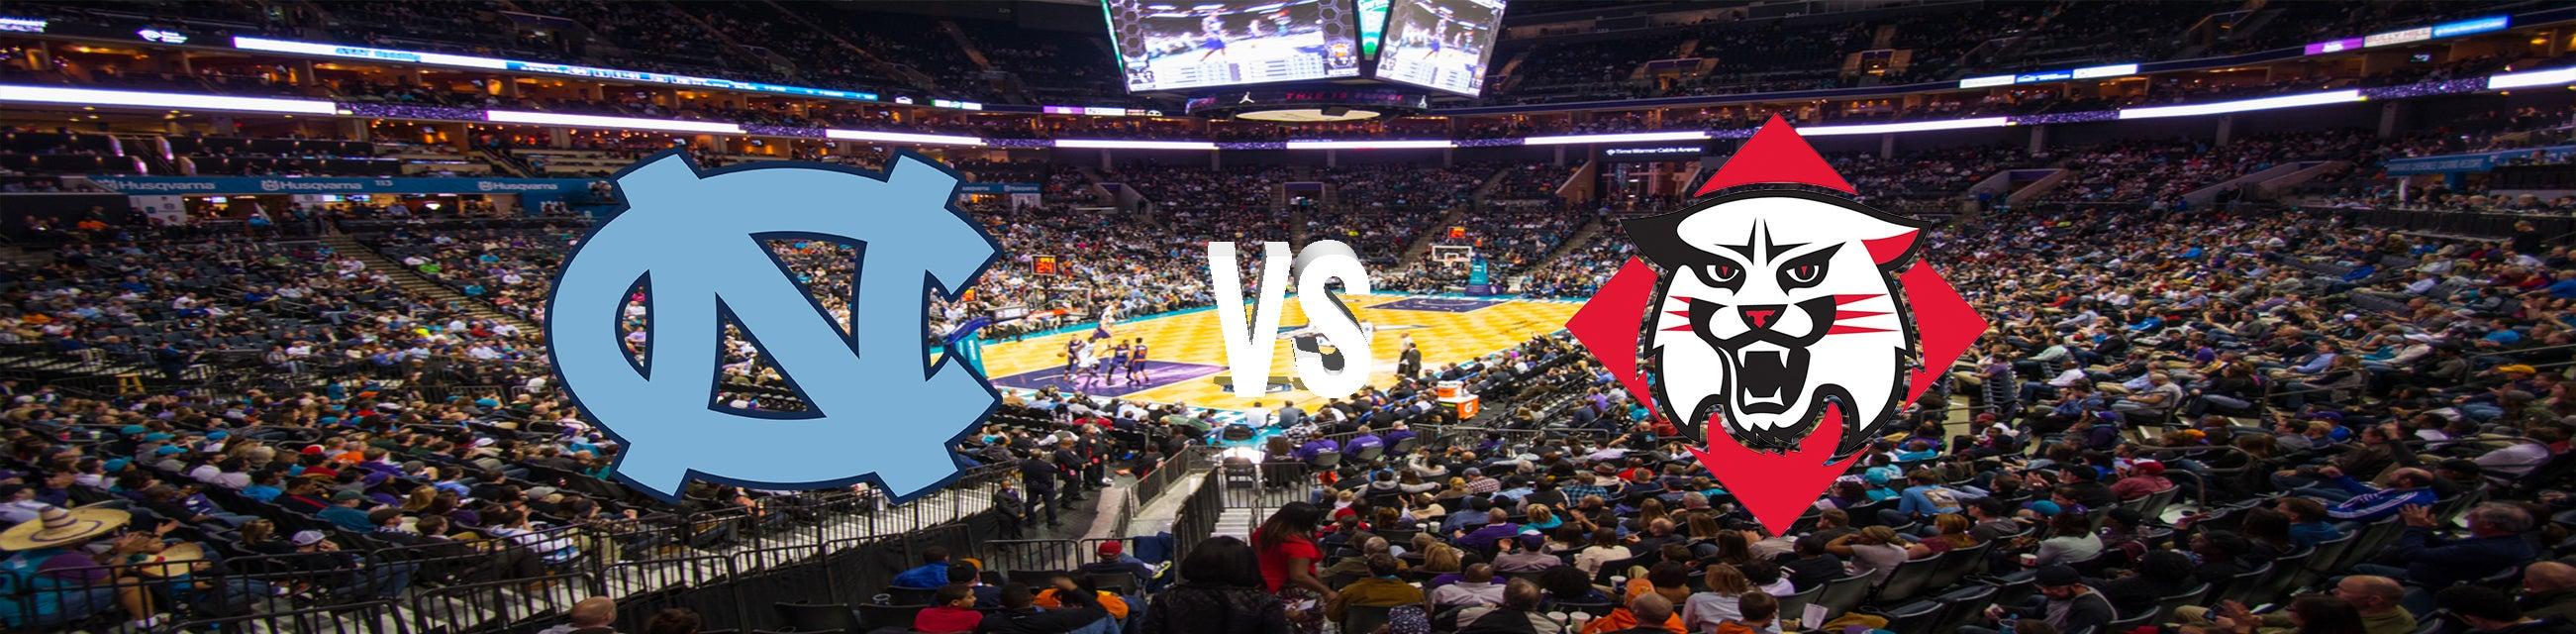 UNC vs Davidson Basketball Tickets